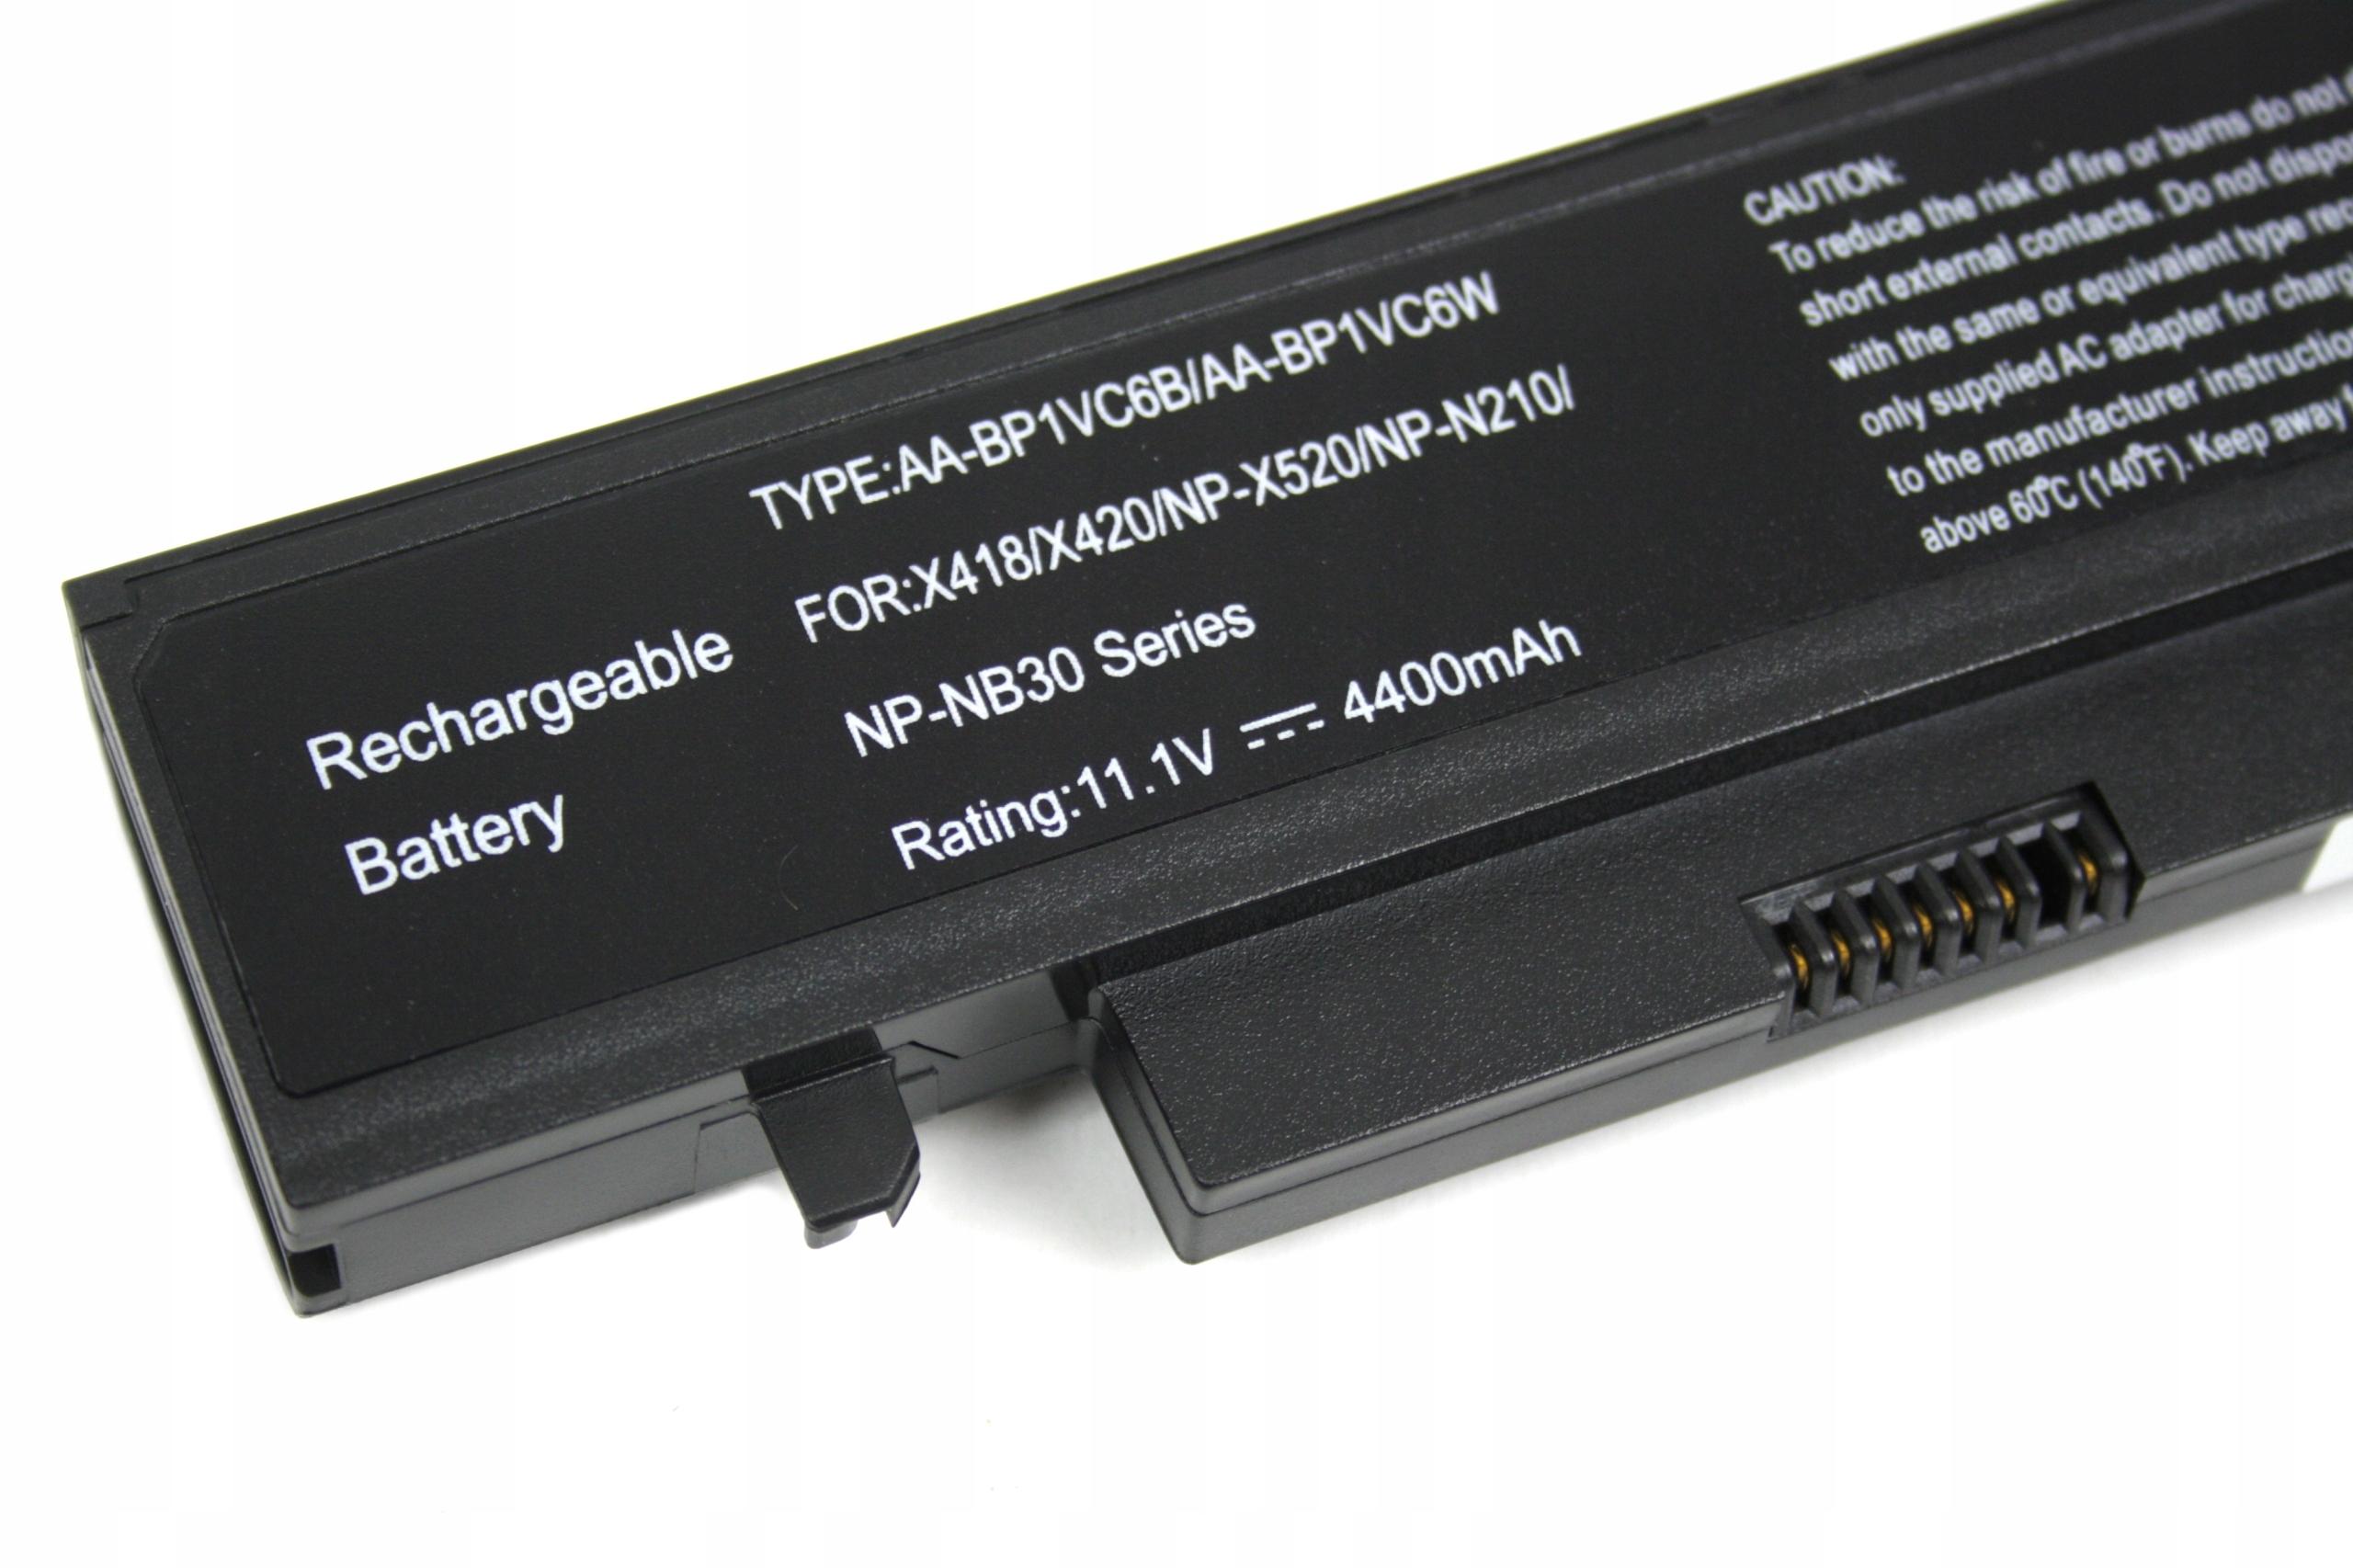 BATERIA AKUMULATOR SAMSUNG NP-N210 Q328 Q330 X418 X420 X520 - Baterie do laptopów